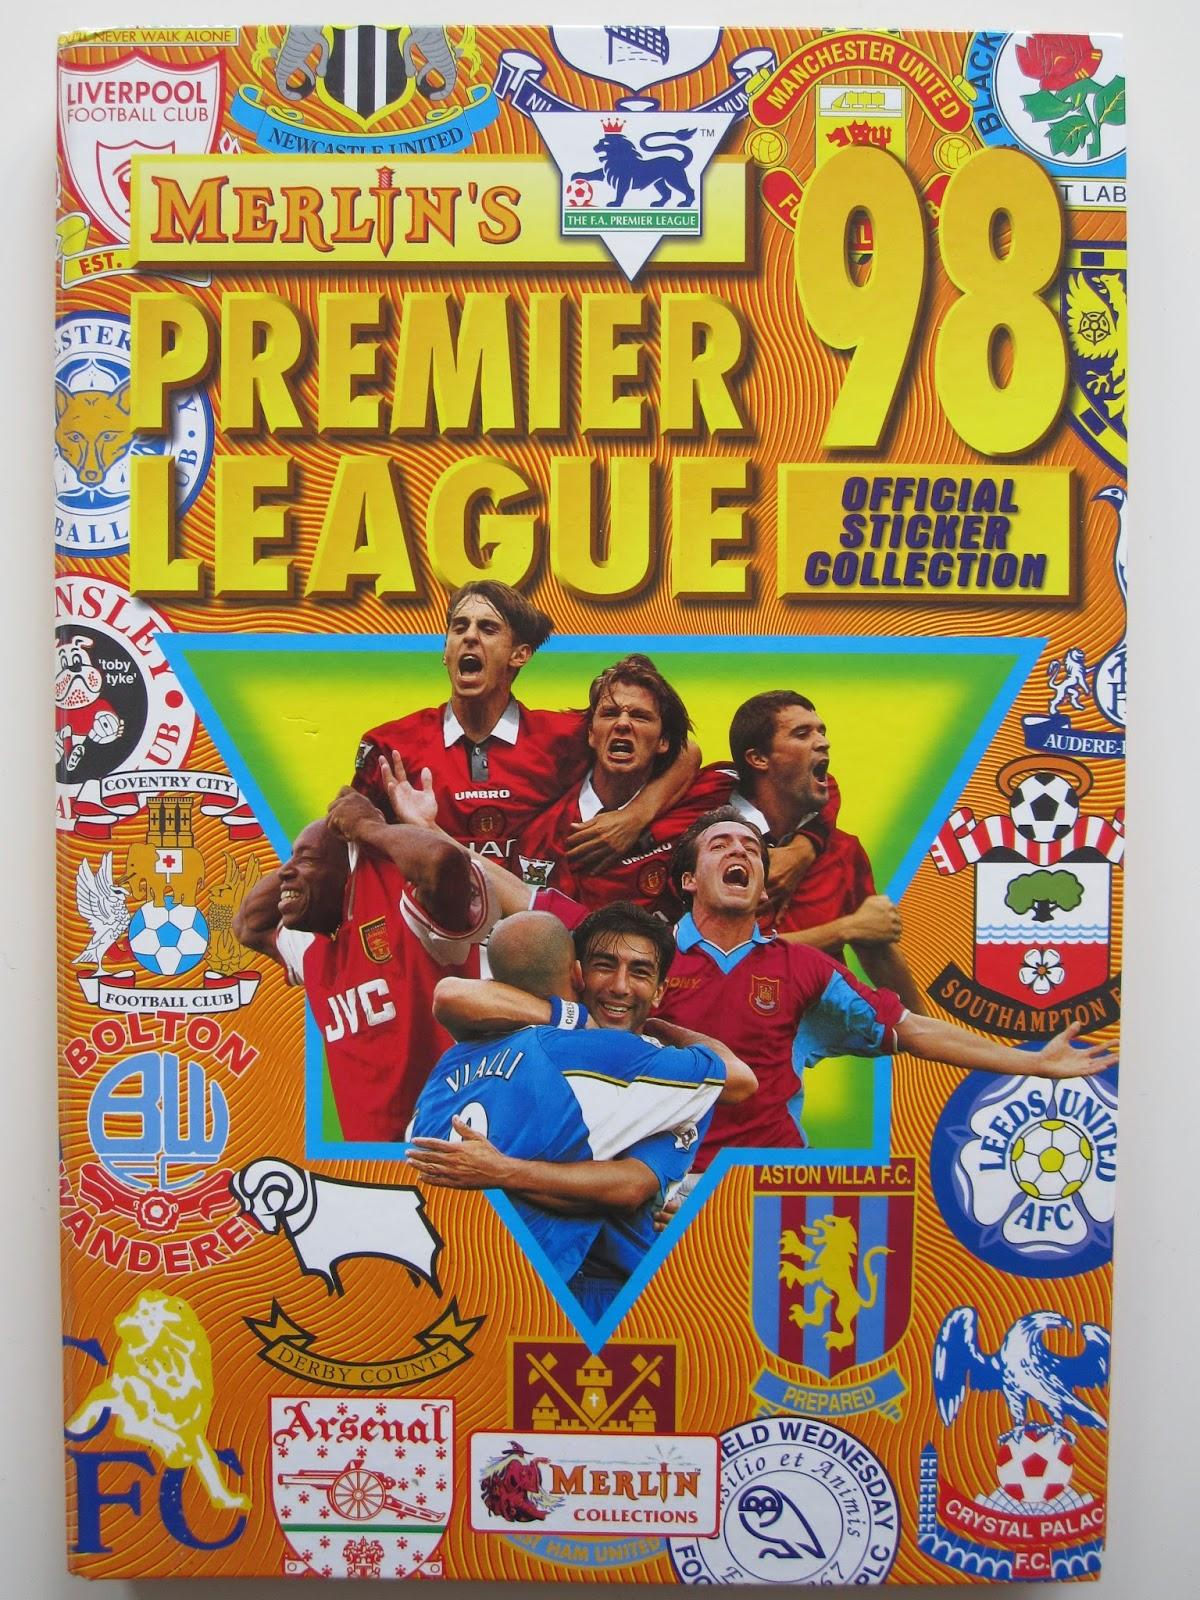 Only good stickers merlin 39 s premier league 98 for Premier league table 99 2000